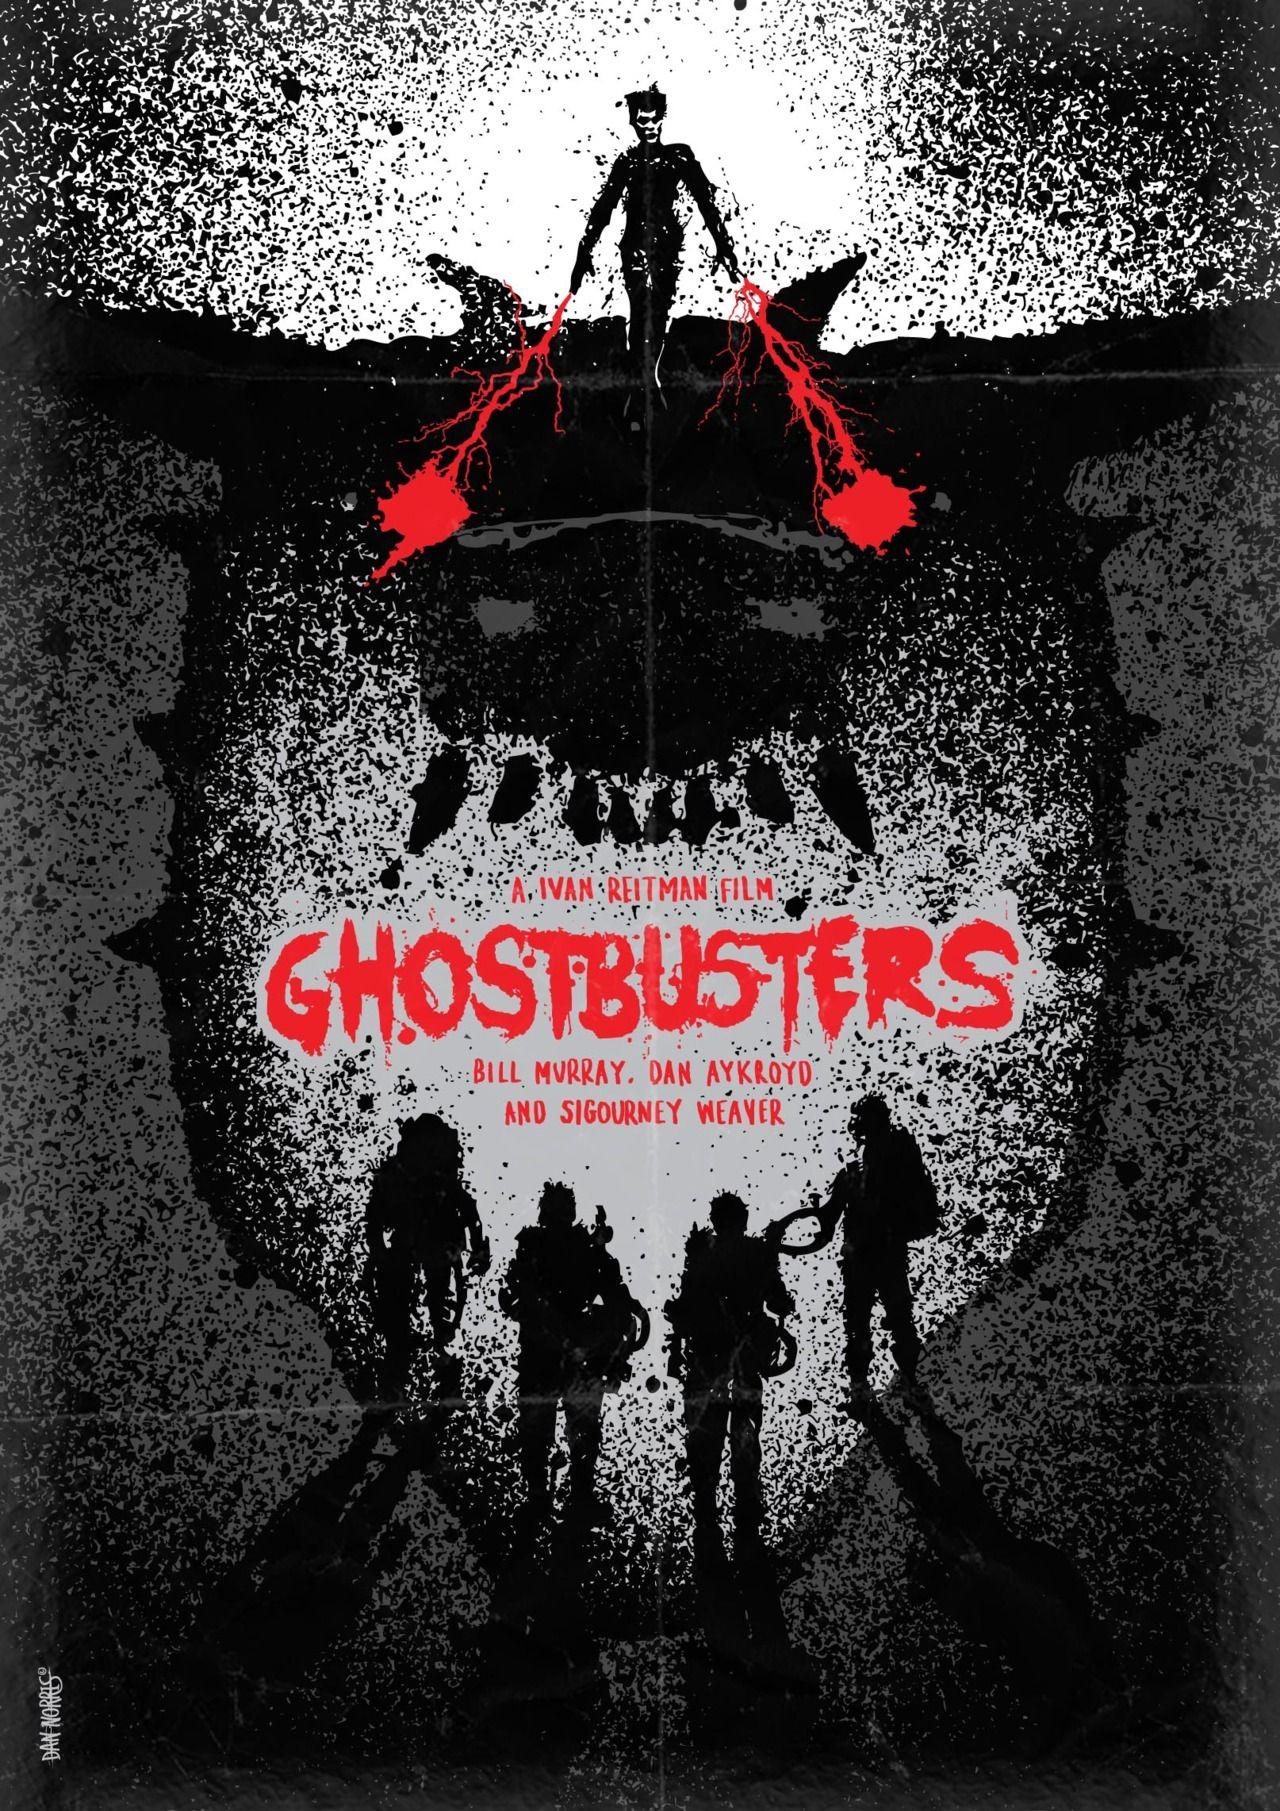 Ghostbusters 1984 Alternative Movie Poster By Daniel Norris